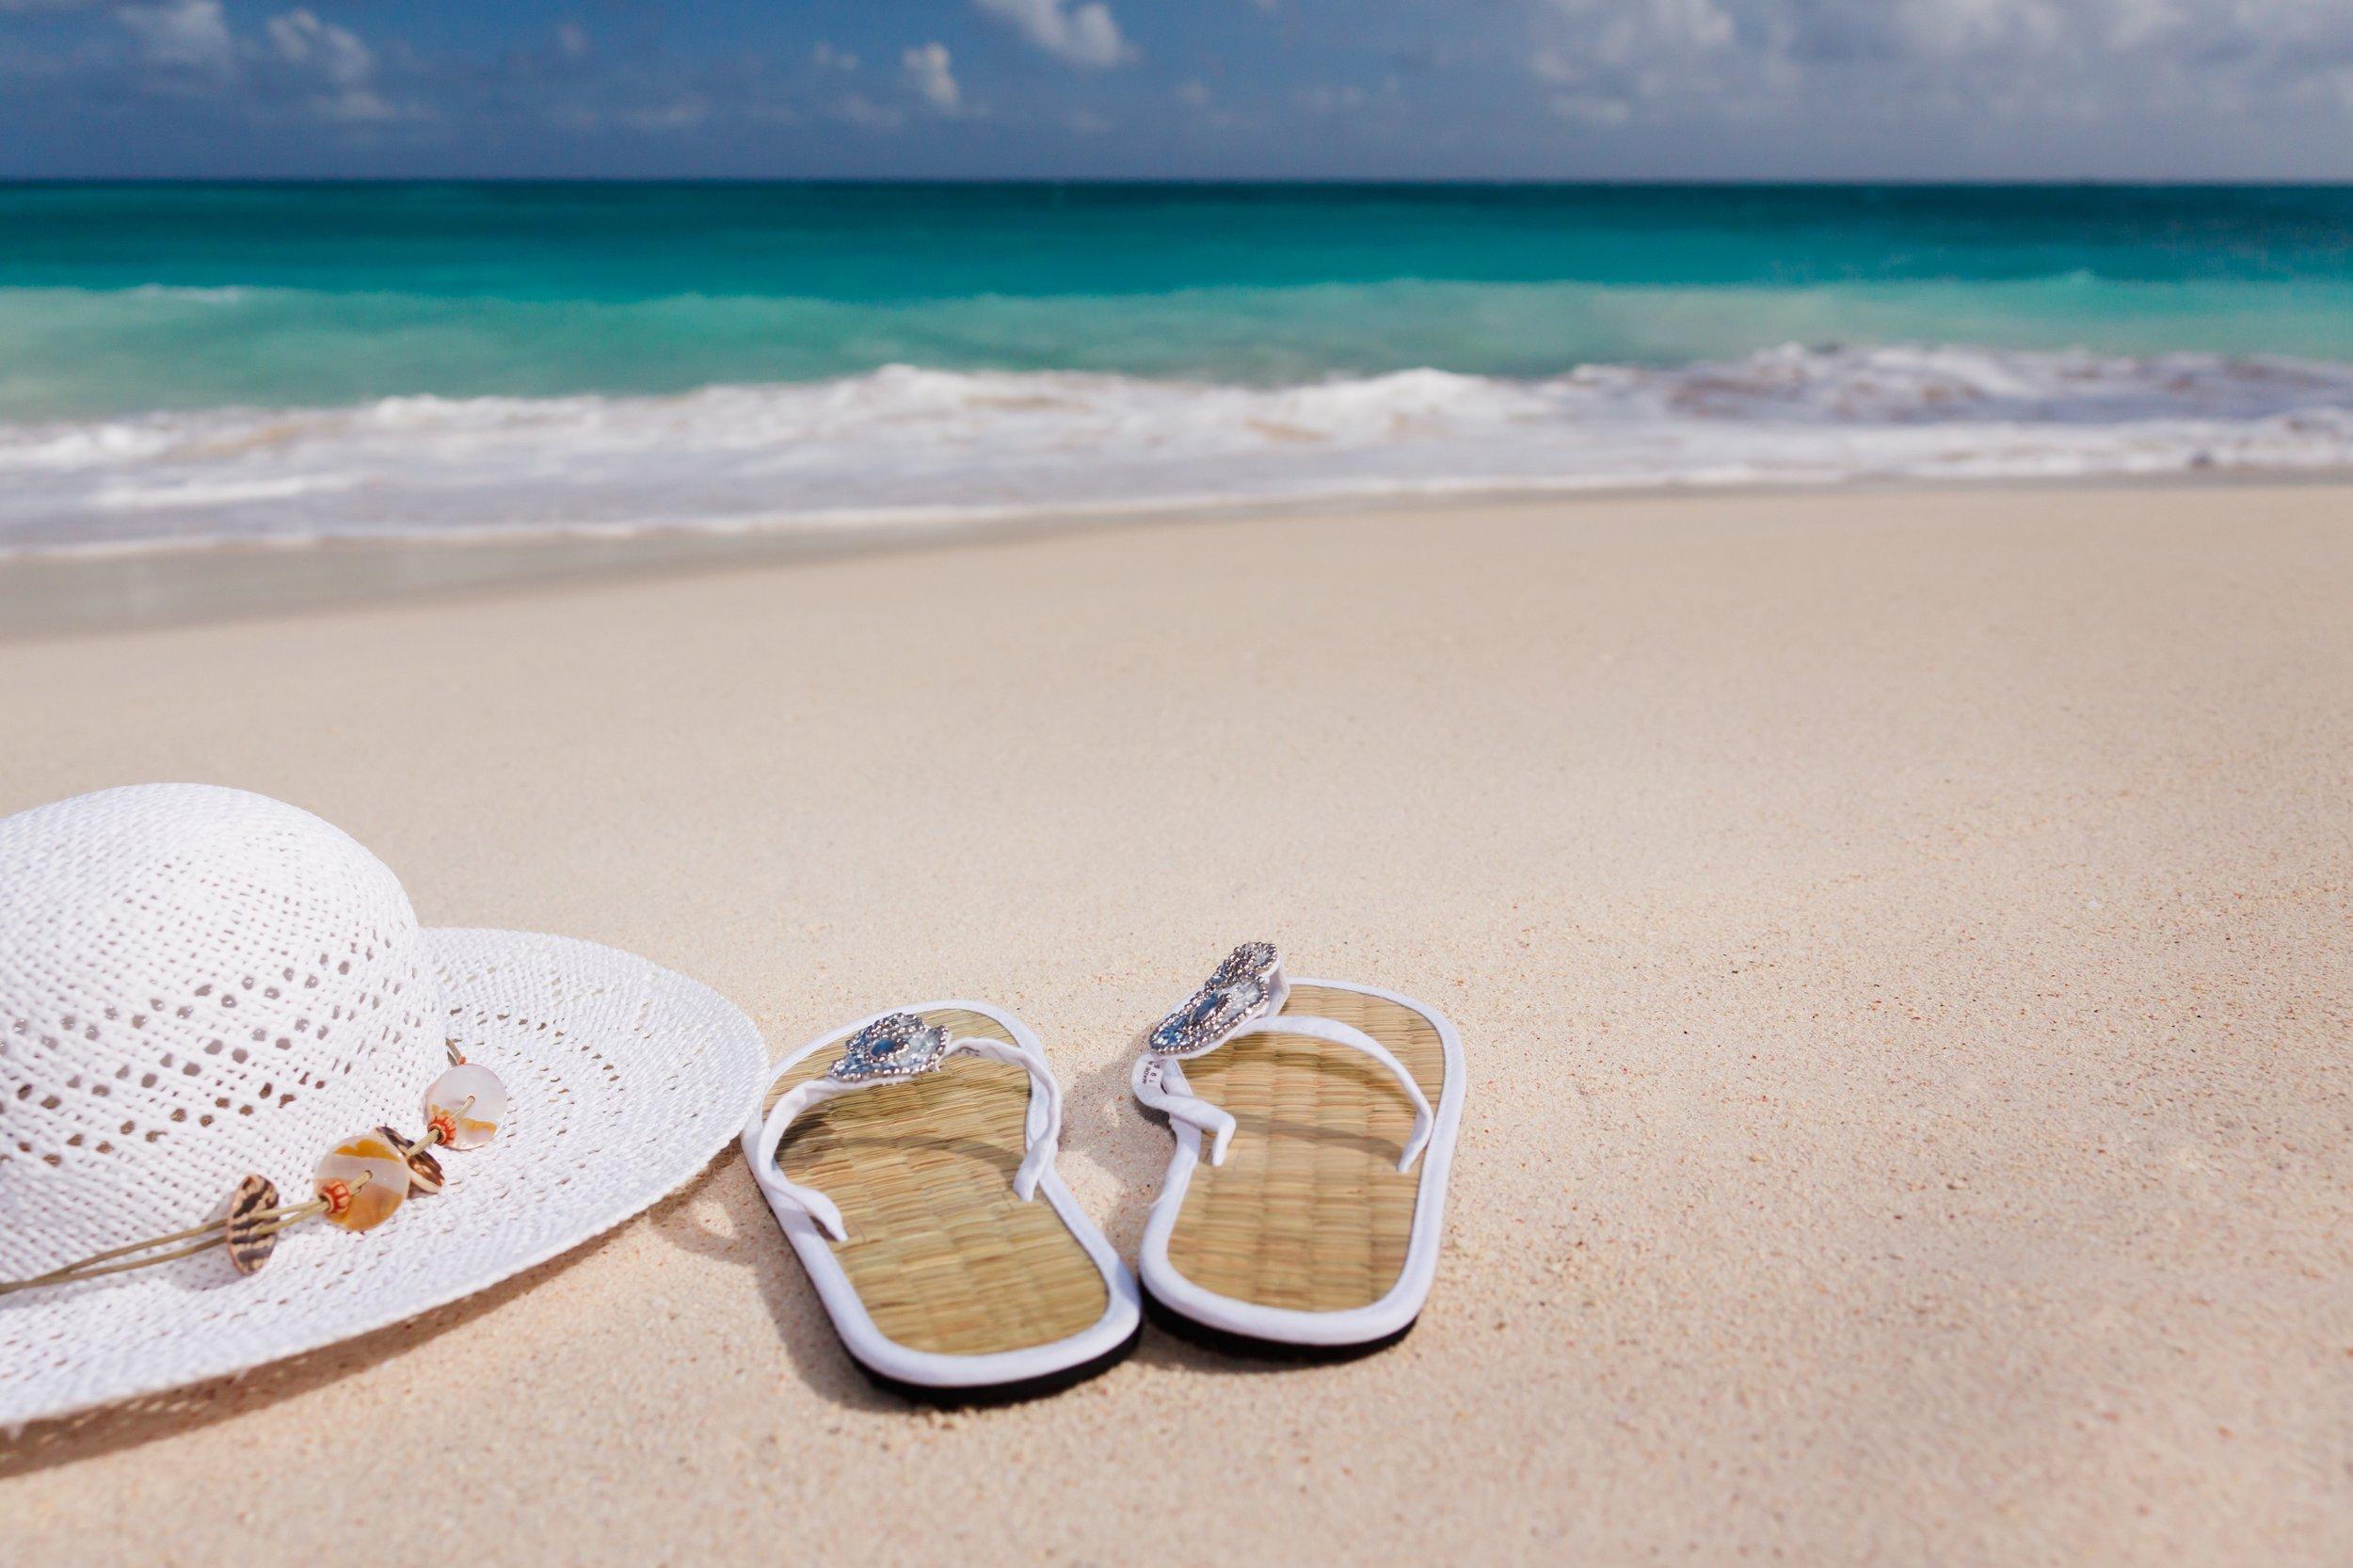 beach-coast-flip-flops-65900.jpg